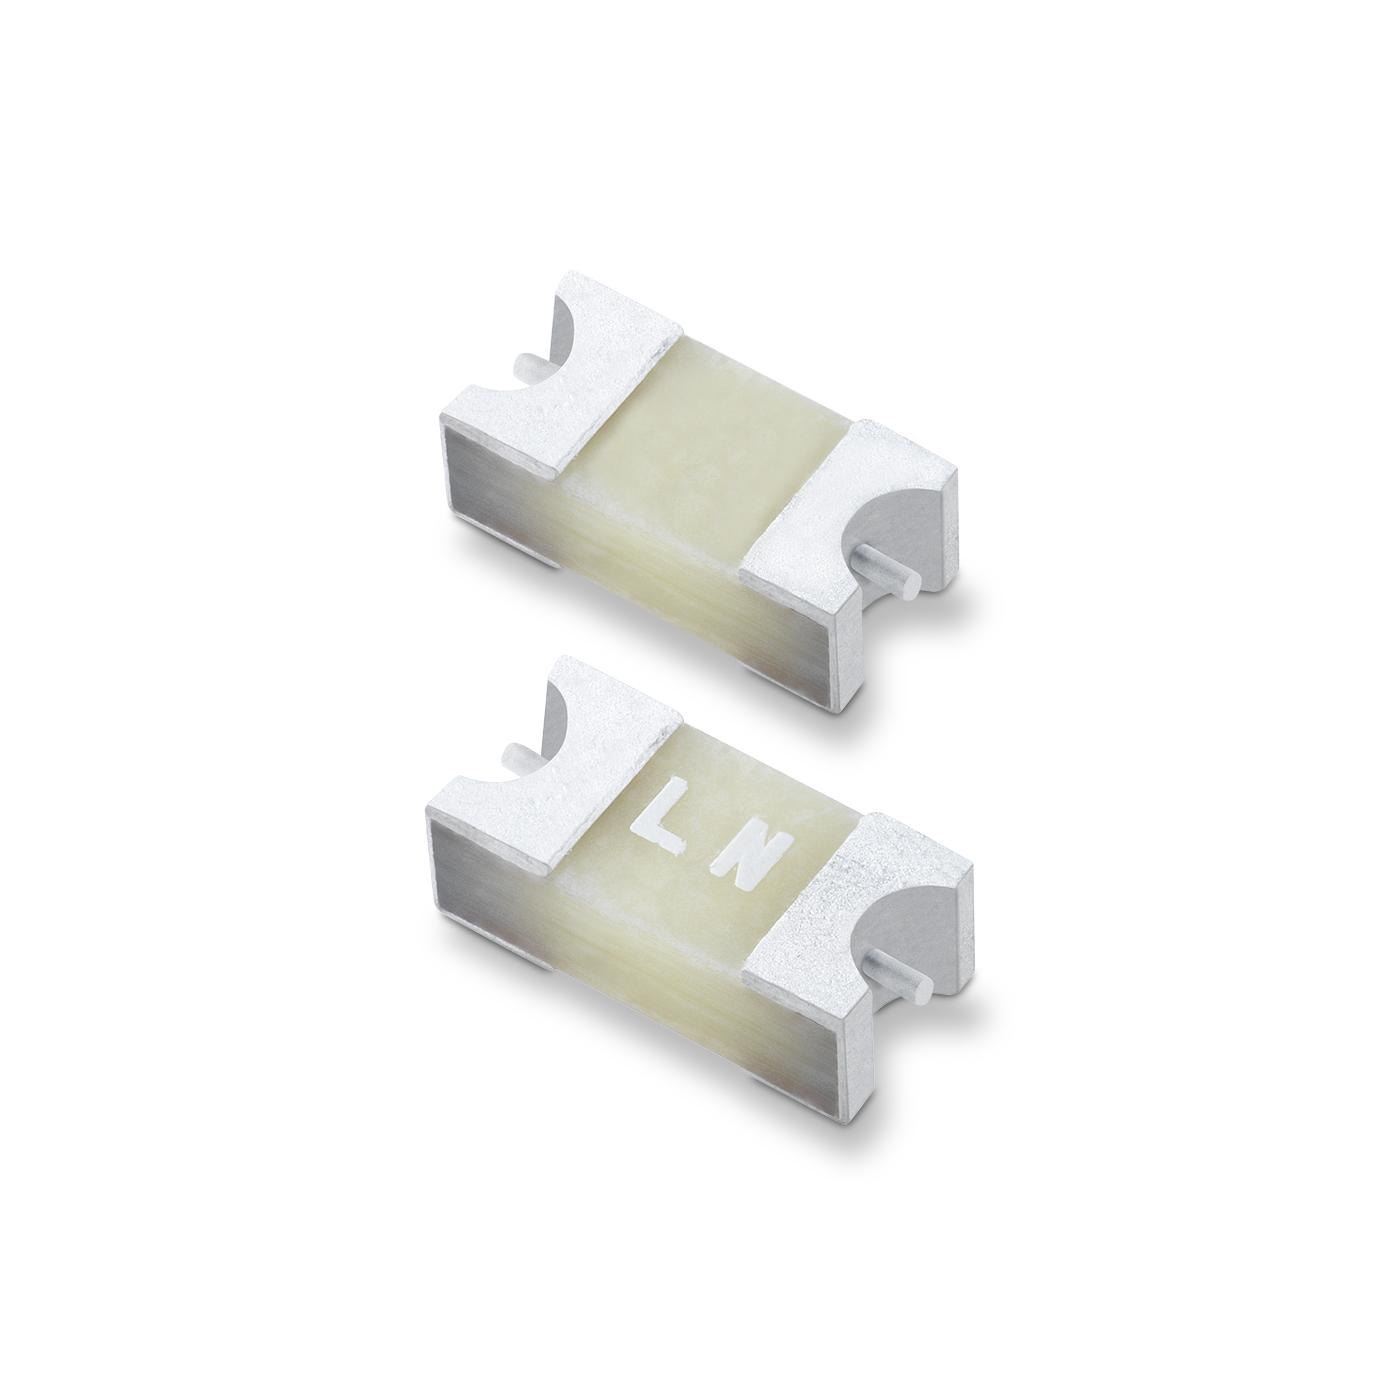 Thin Film Chip Fuses Littelfuse Fuse Box Holder 465